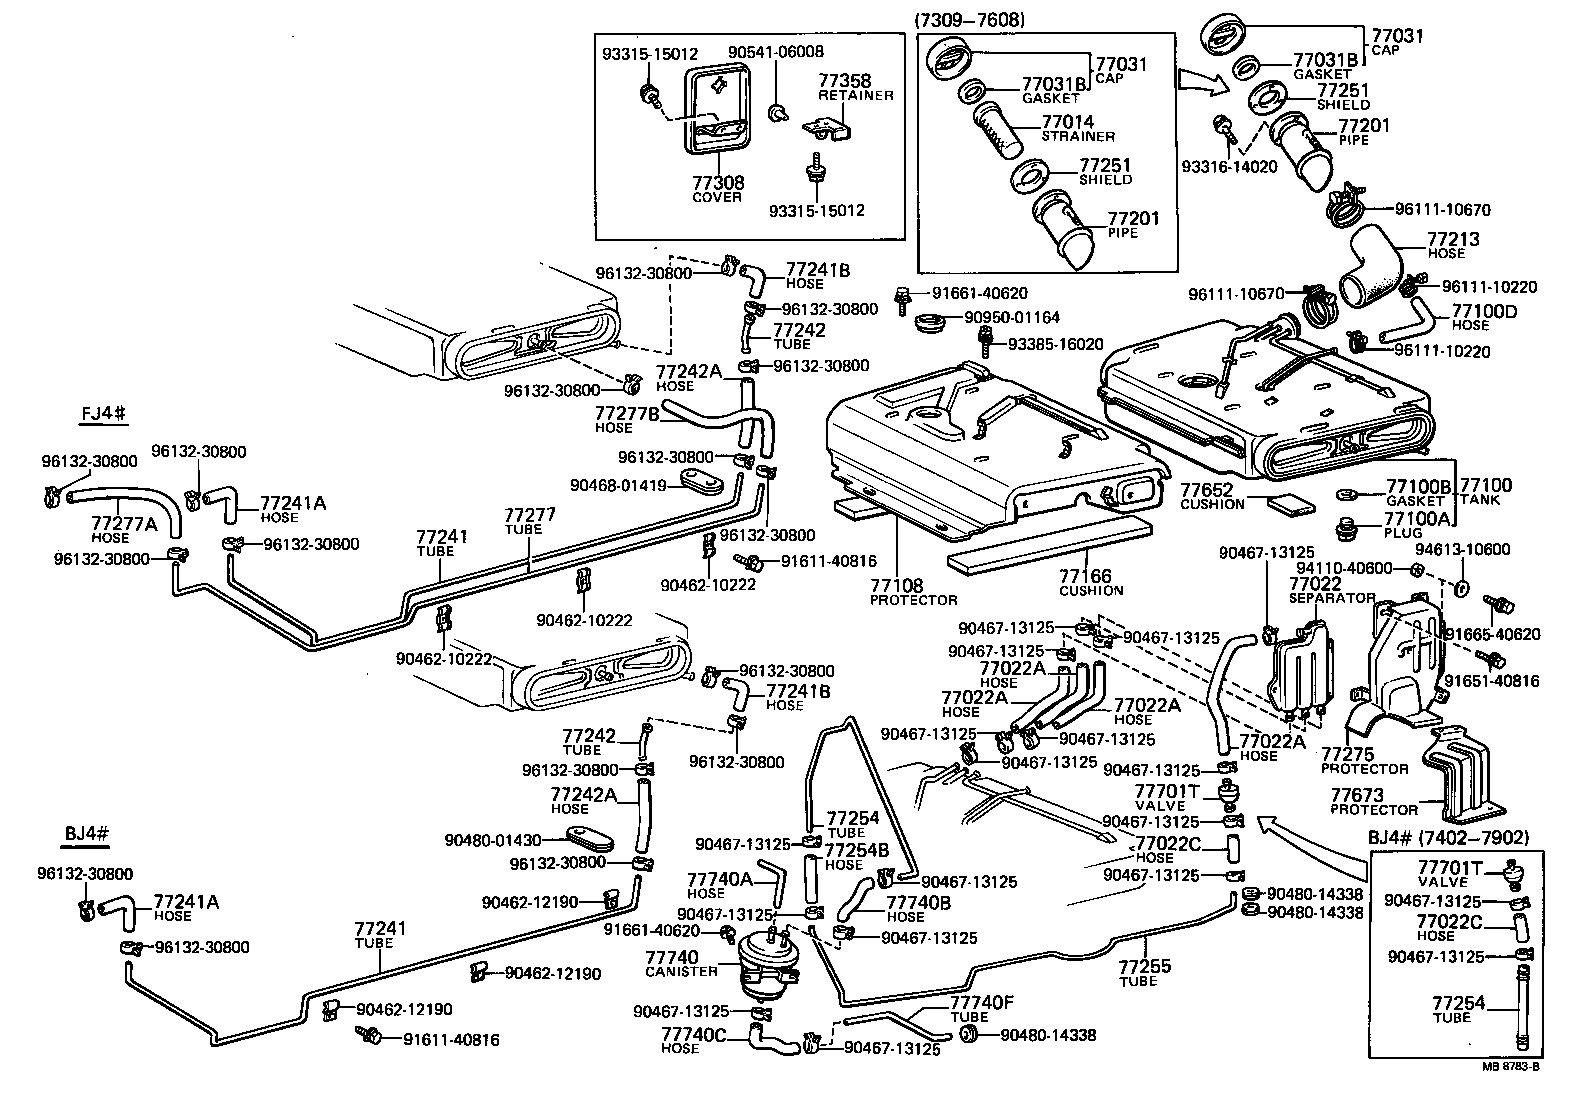 1973 toyota land cruiser fuel tank